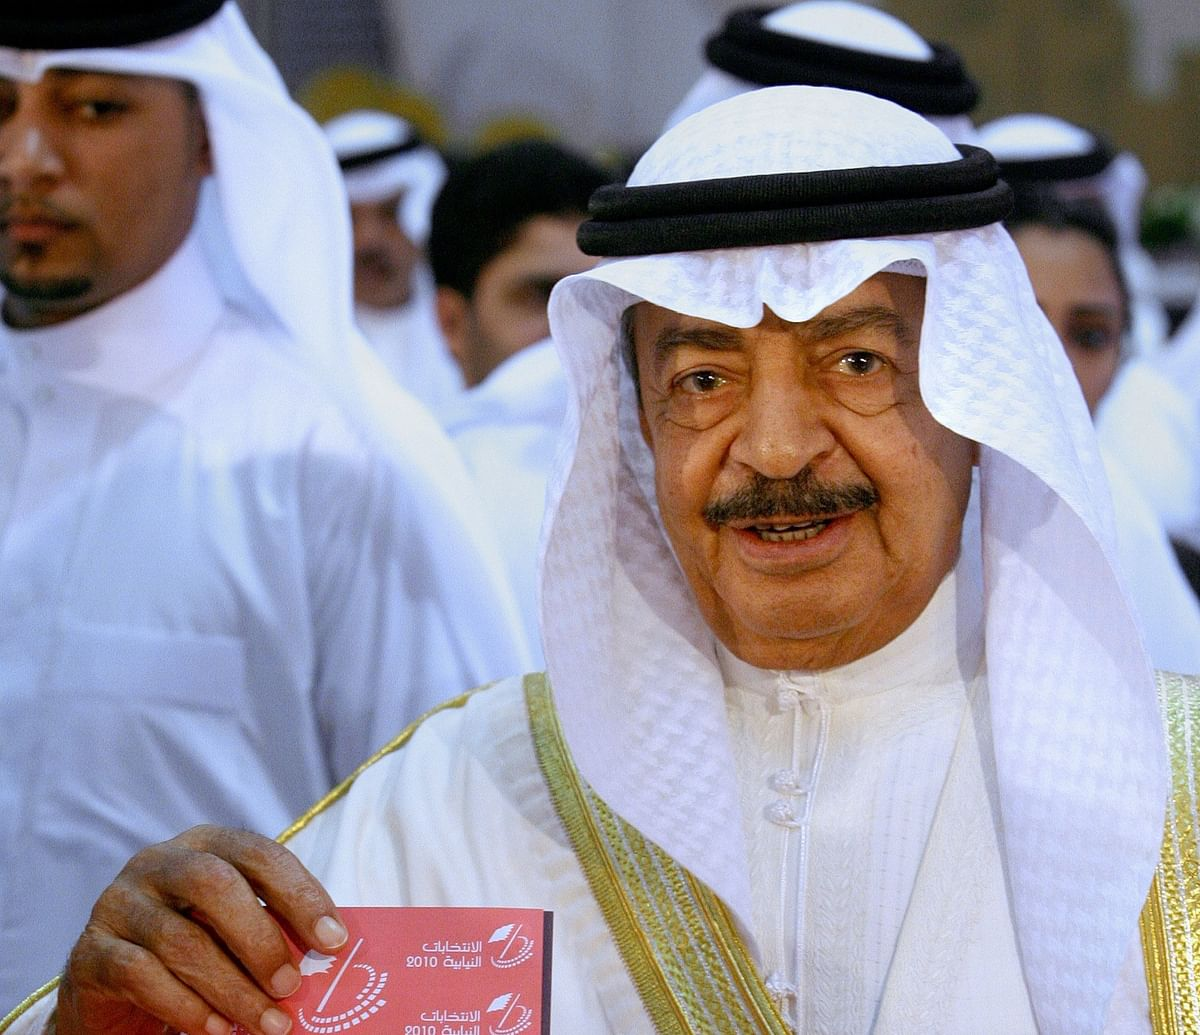 Sheikh Khalifa, Bahrain's long-serving Prime Minister, dies at 84